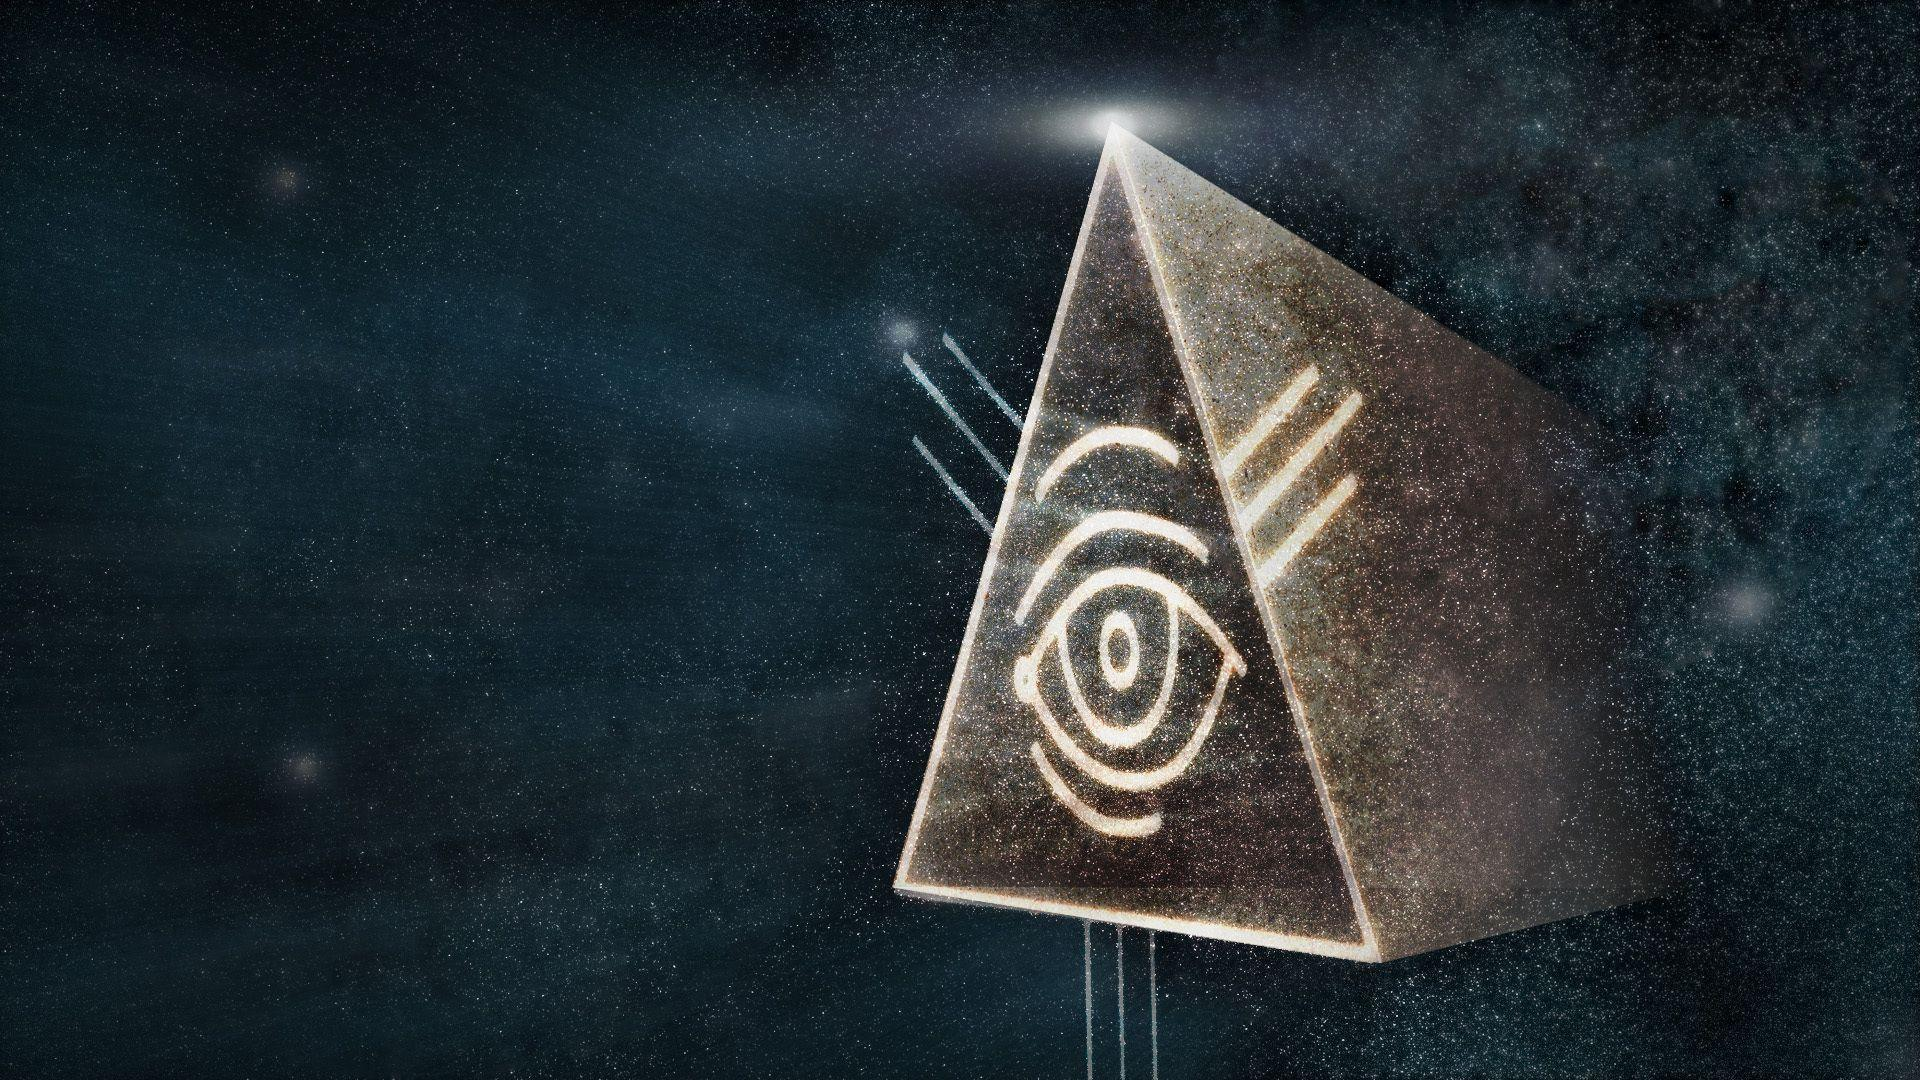 illuminati symbol wallpaper 1920x1080 - photo #24